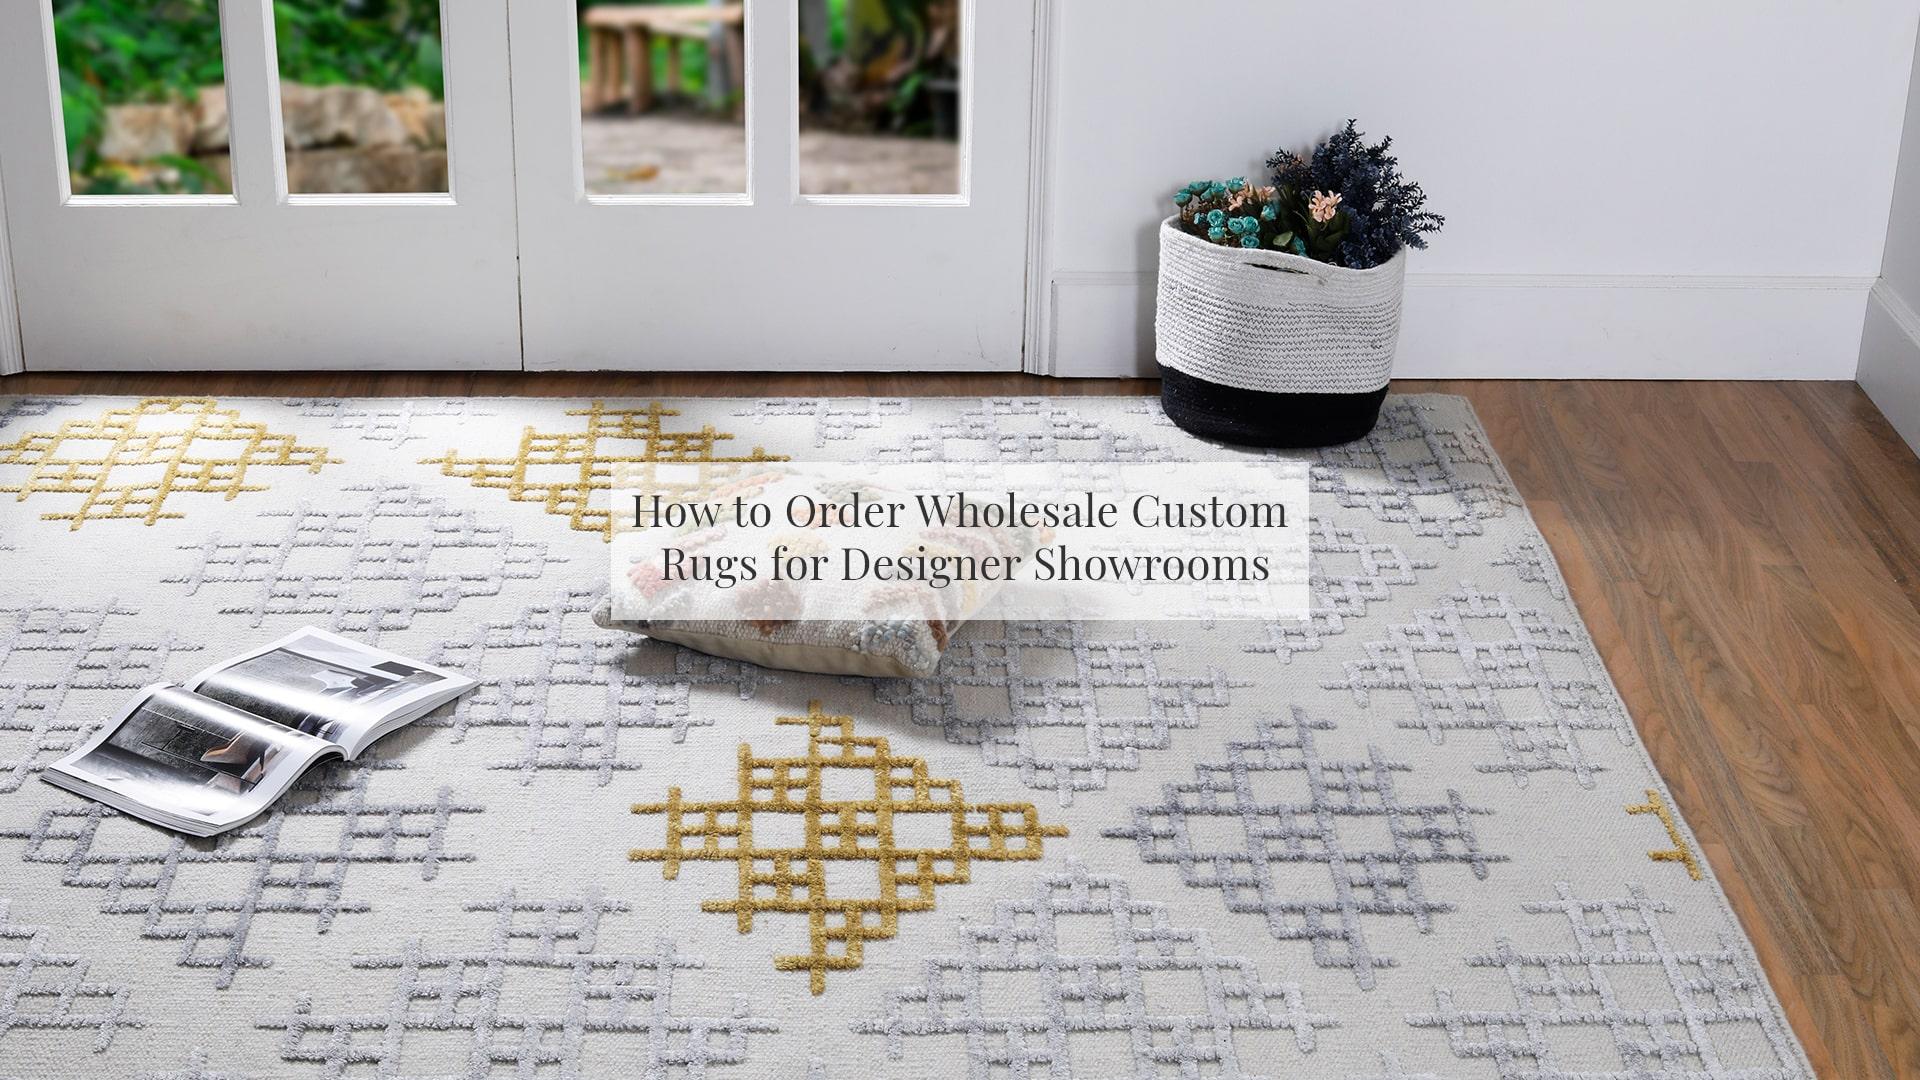 Wholesale Custom Rugs for Designer Showrooms